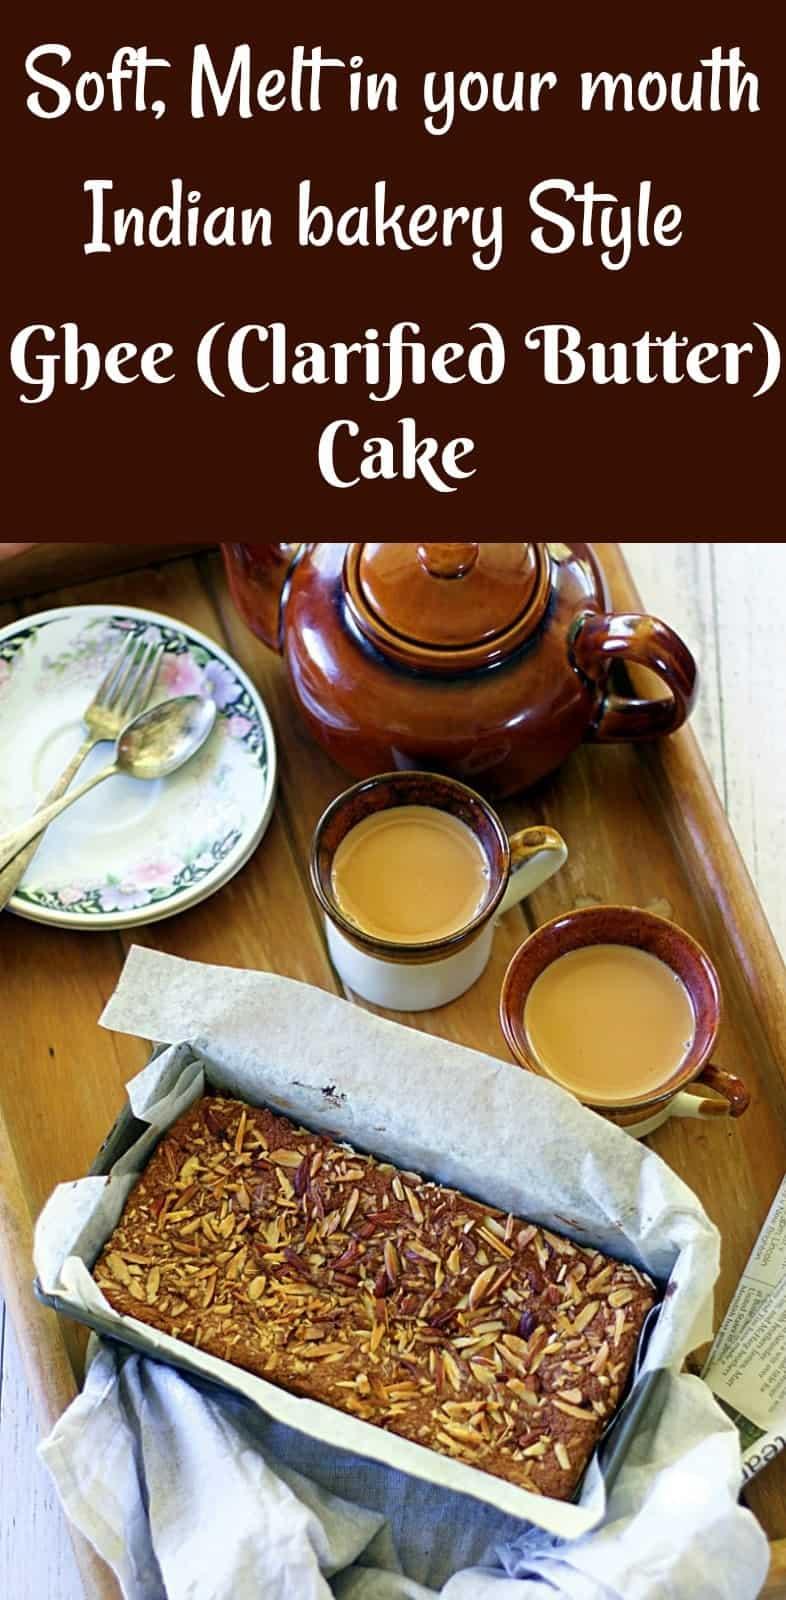 ghee cake kerala style ghee cake calicut ghee cake indian cake indian bakery cake indian style ghee cake kozhikode cake indian bakery style ghee cake indian bakery style tea cake ghee loaf cake loaf cake food styling loaf cake photography